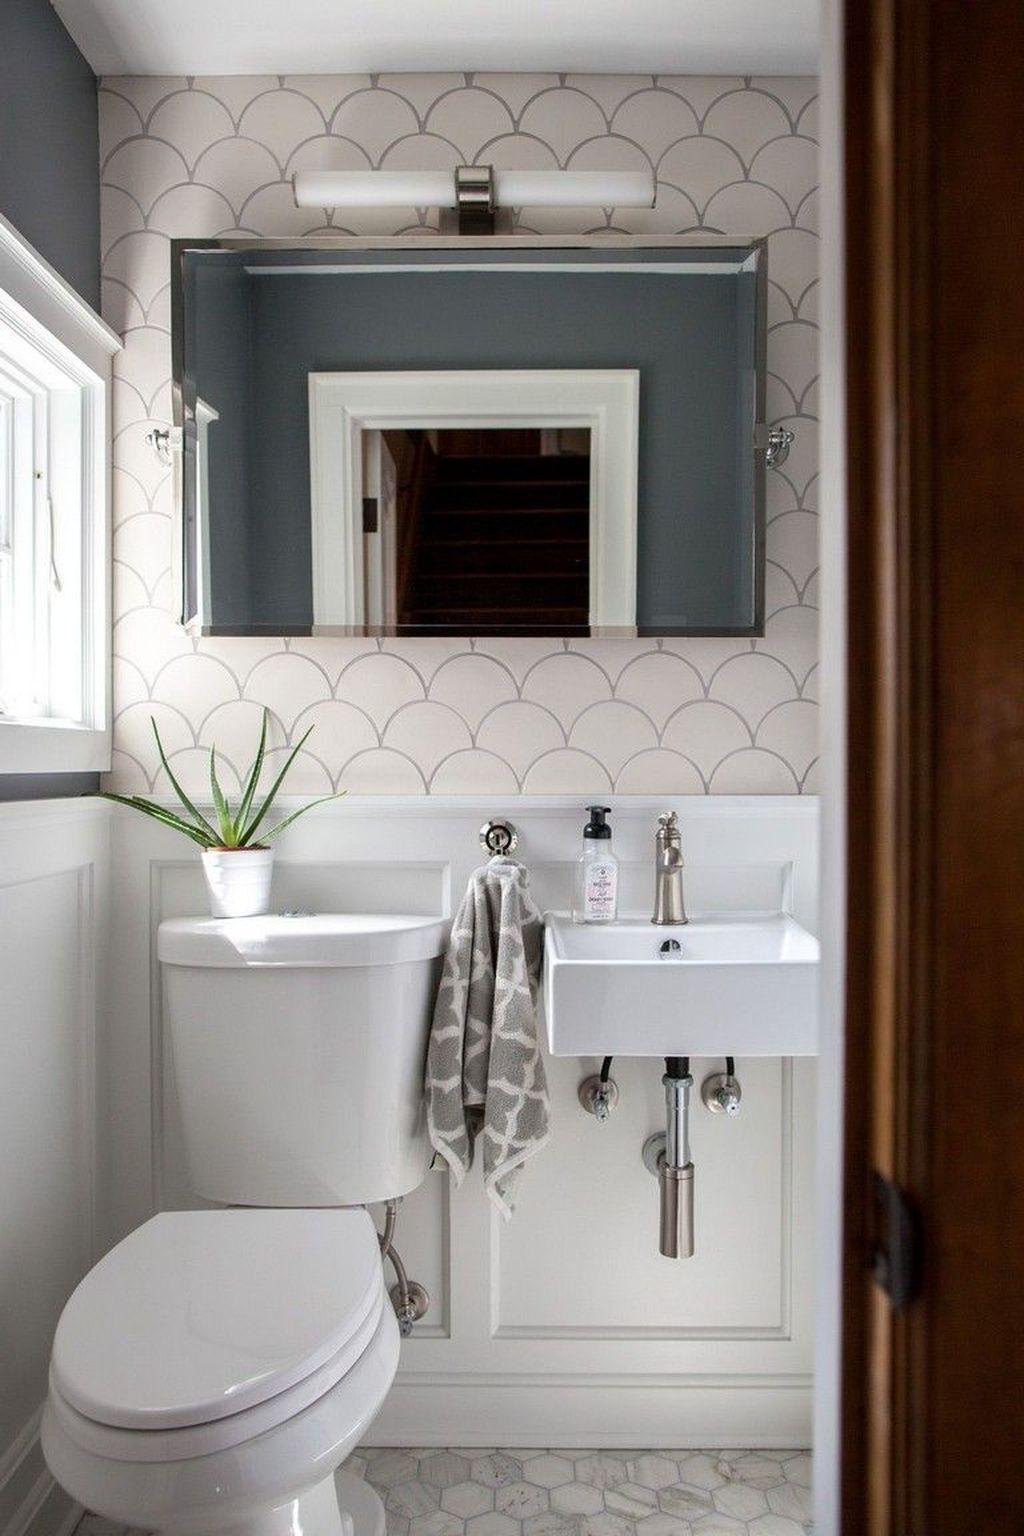 20 Beautiful Half Bathroom Remodel Cost Ideas And Galleries In 2020 Powder Room Small Tiny Powder Rooms Half Bathroom Remodel